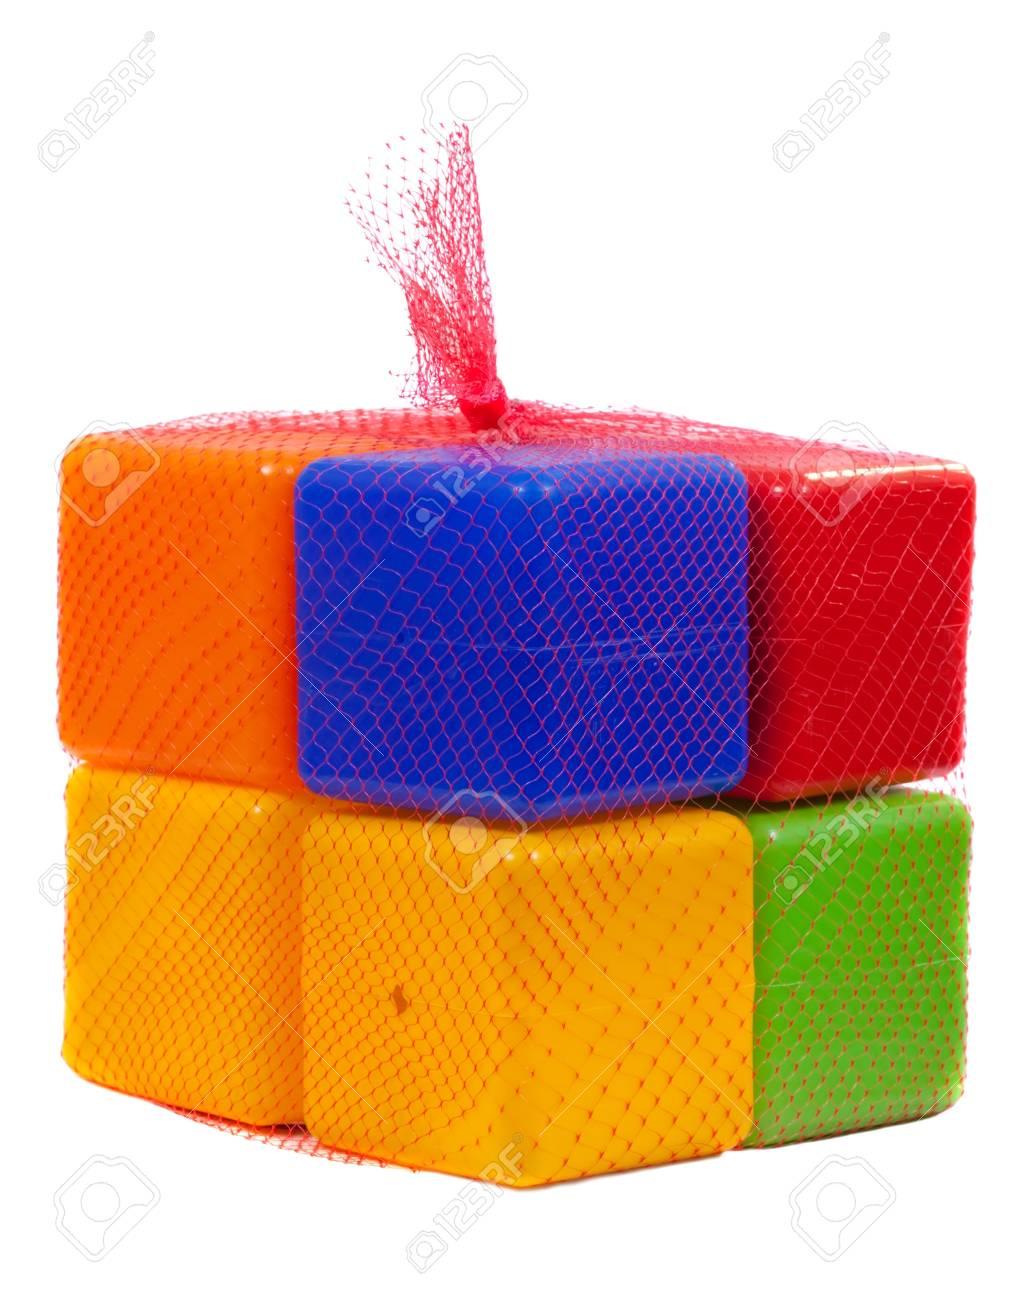 Packed plastic toy blocks on white background Stock Photo - 10884930